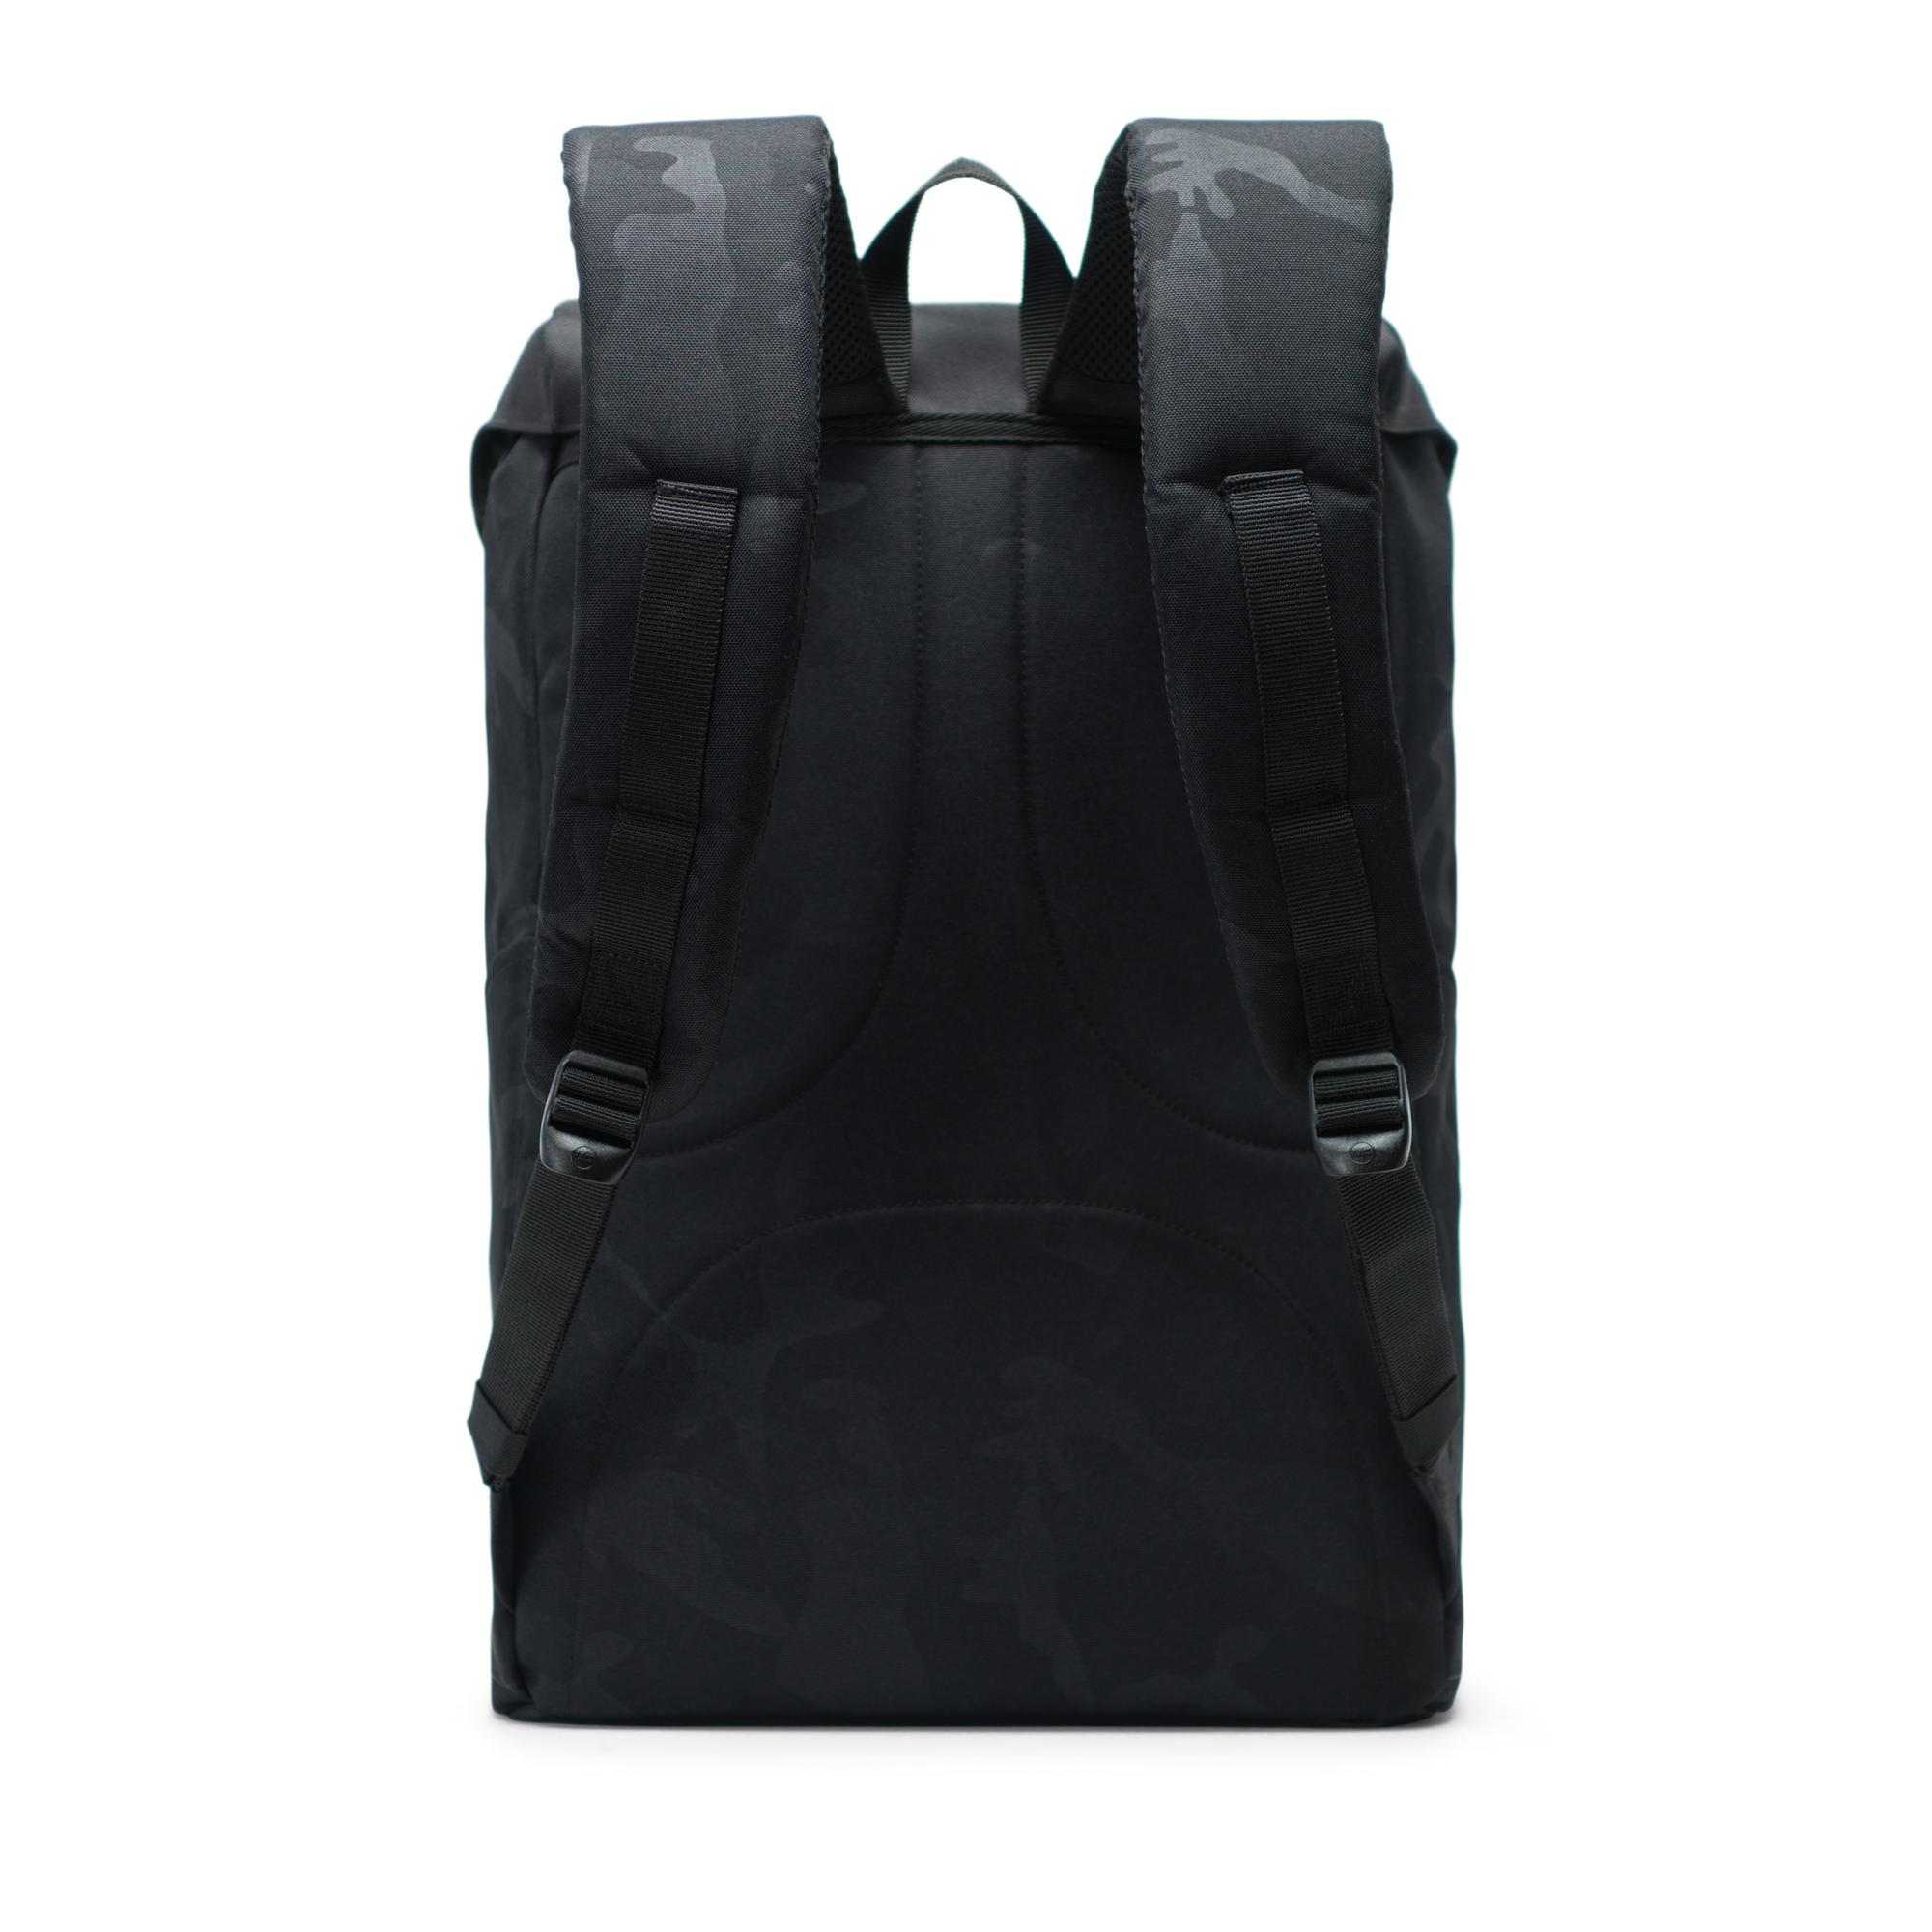 7fdd4356aa3e Buckingham Backpack Delta